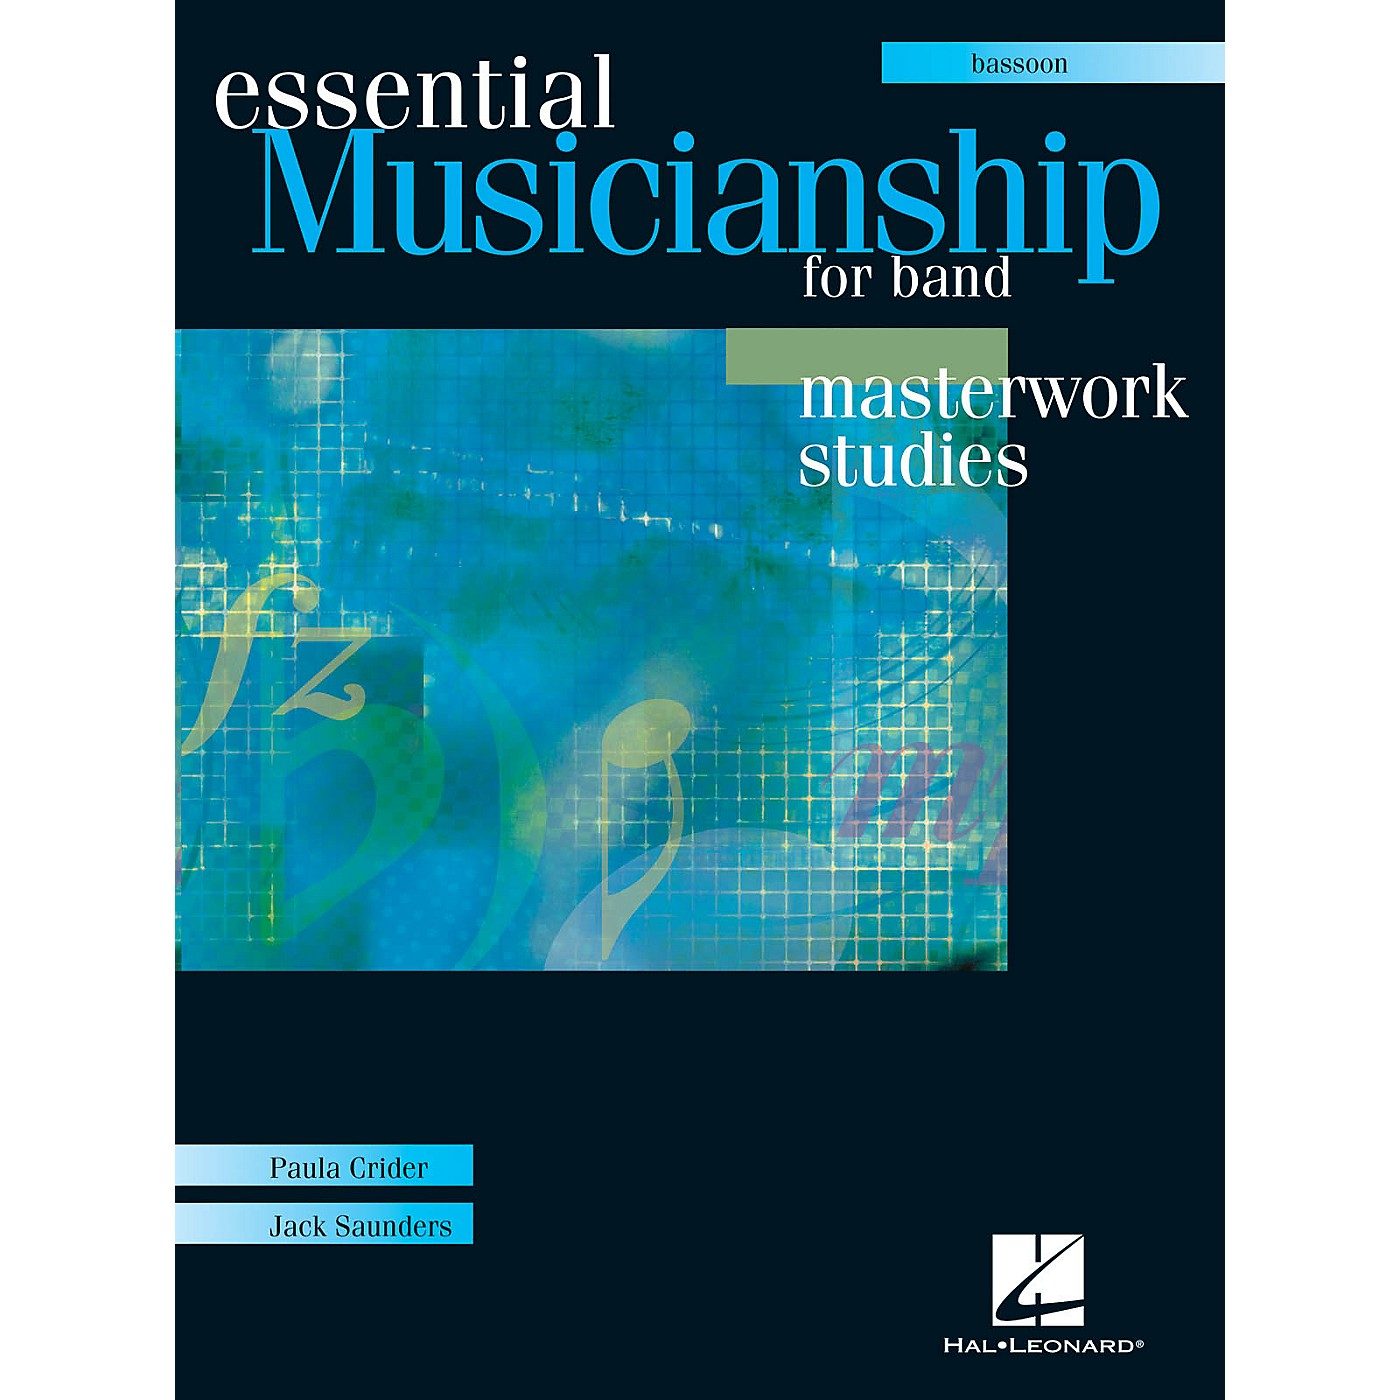 Hal Leonard Essential Musicianship for Band - Masterwork Studies (Bassoon) Concert Band thumbnail